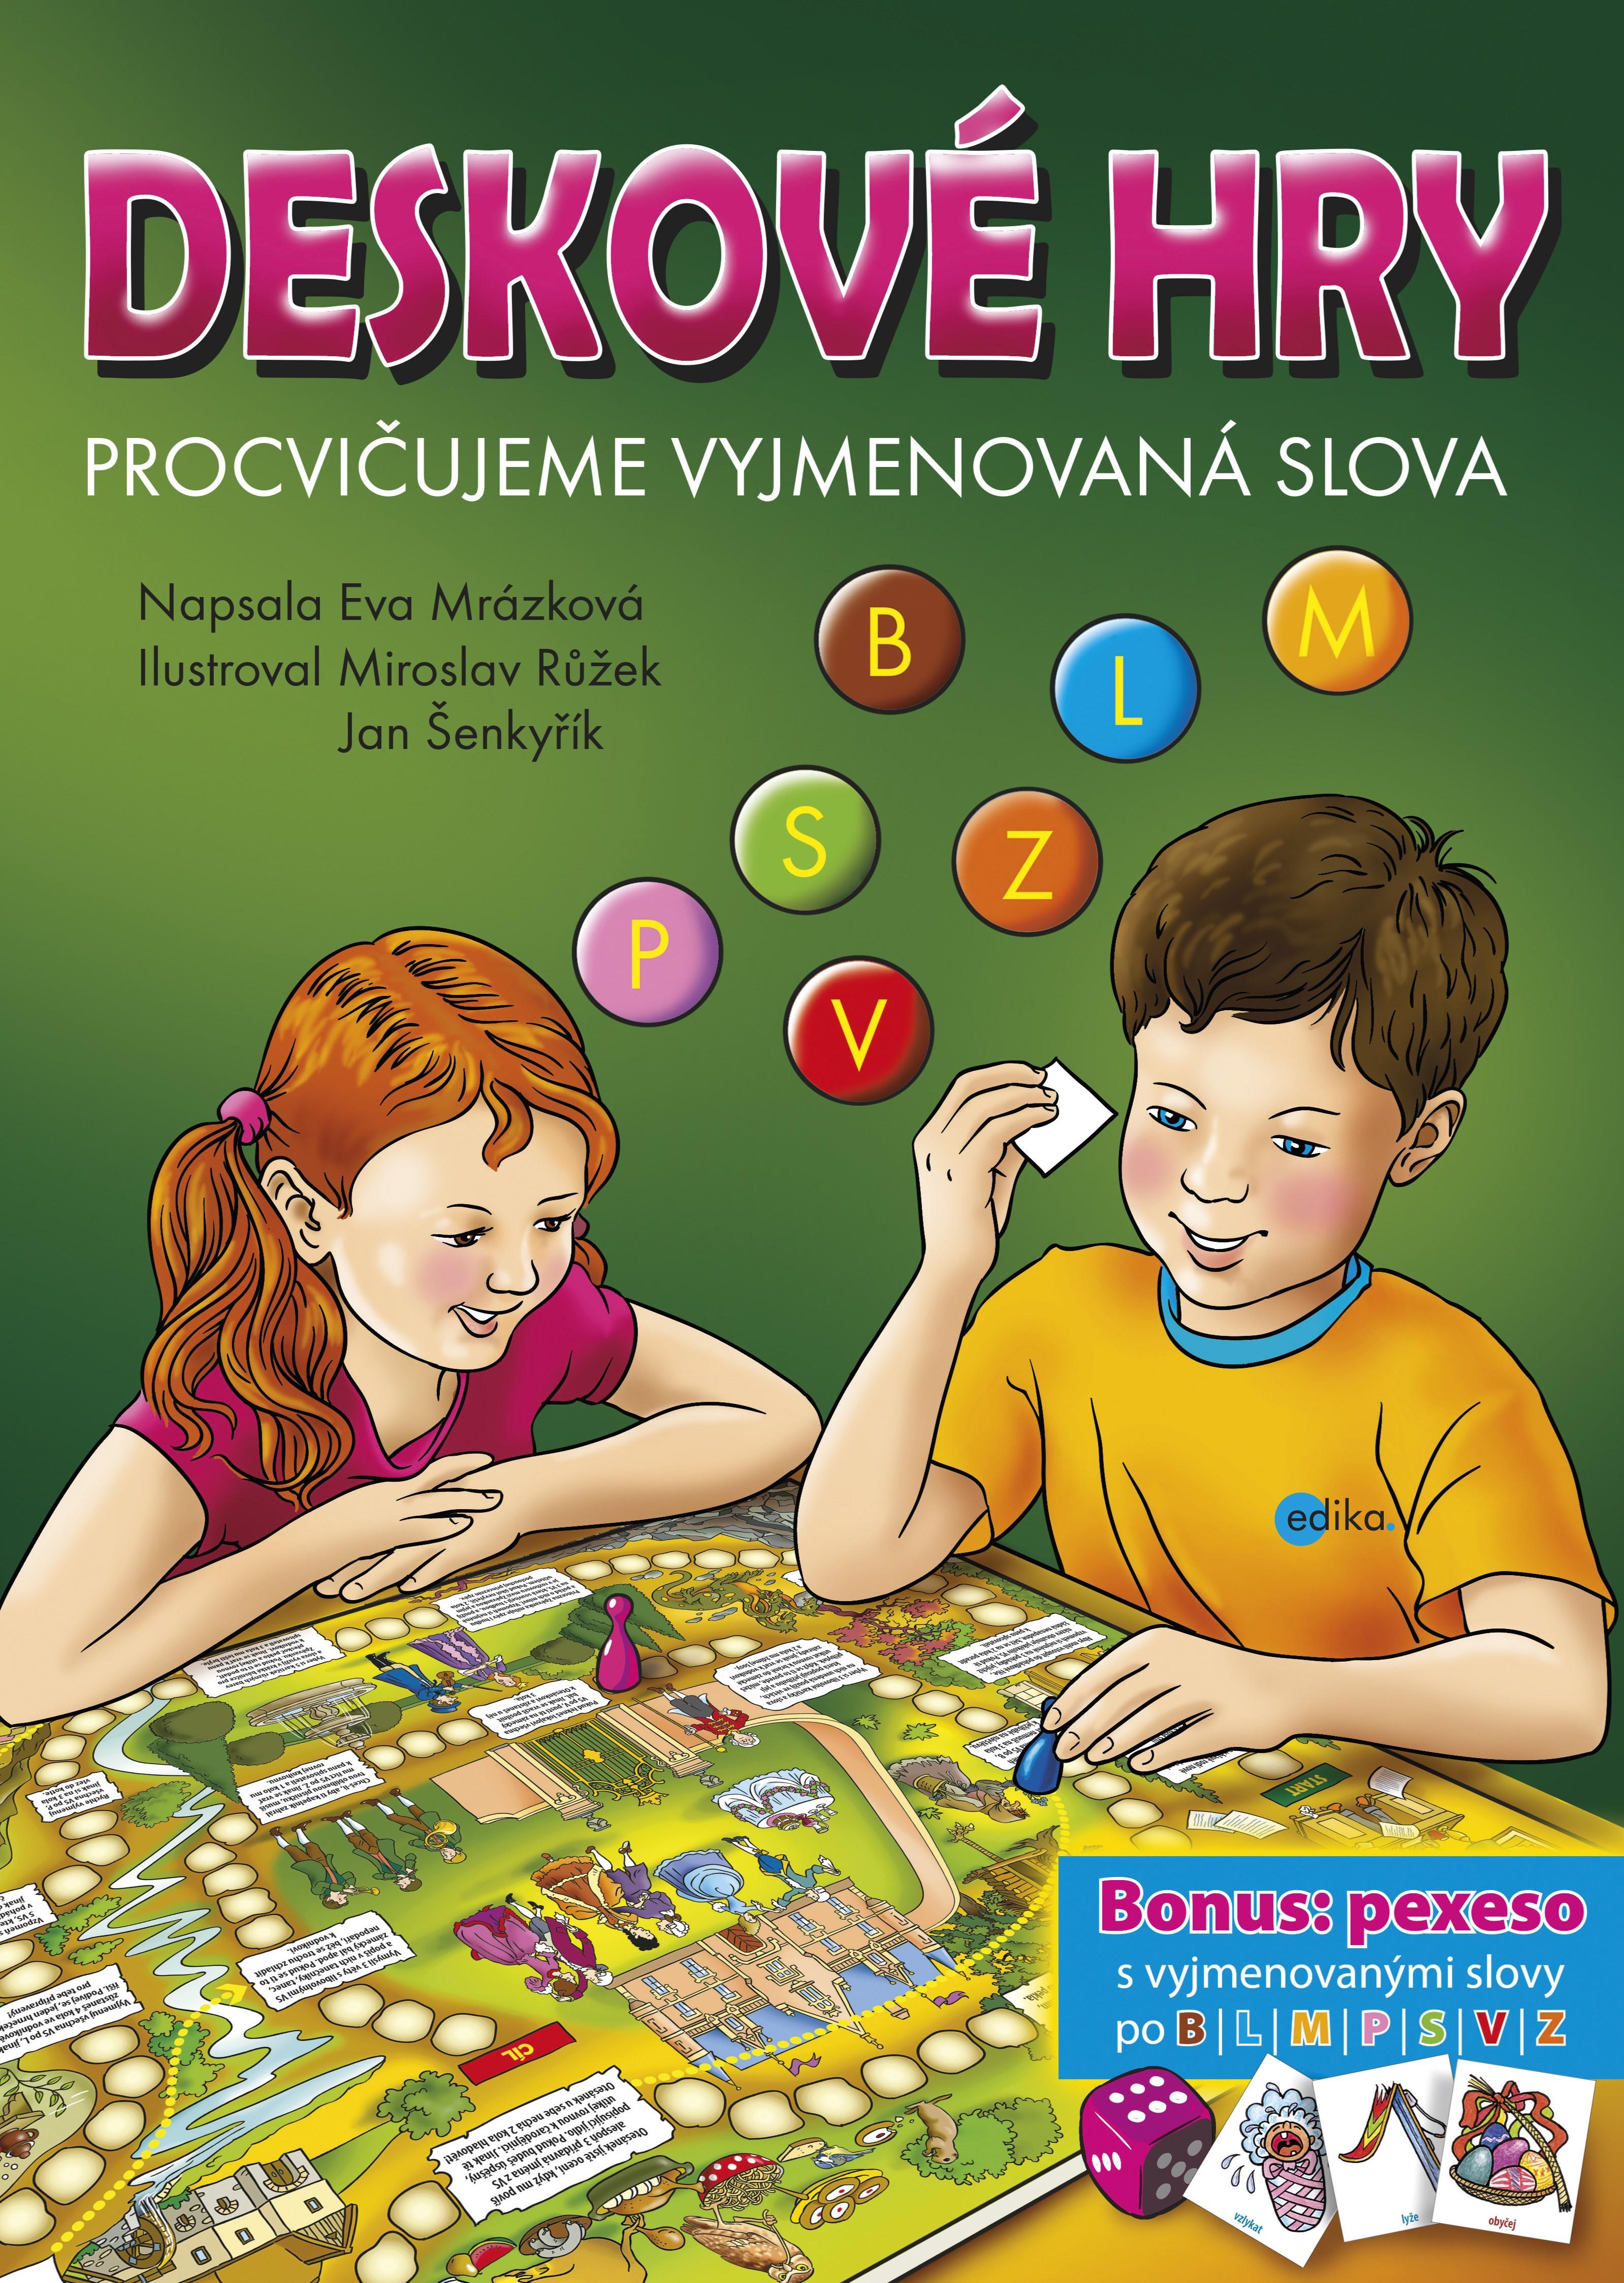 Deskové hry. Procvičujeme vyjmenovaná slova - B, L, M, P, S, V, Z | Jan Šenkyřík, Eva Mrázková, Růžek Miroslav